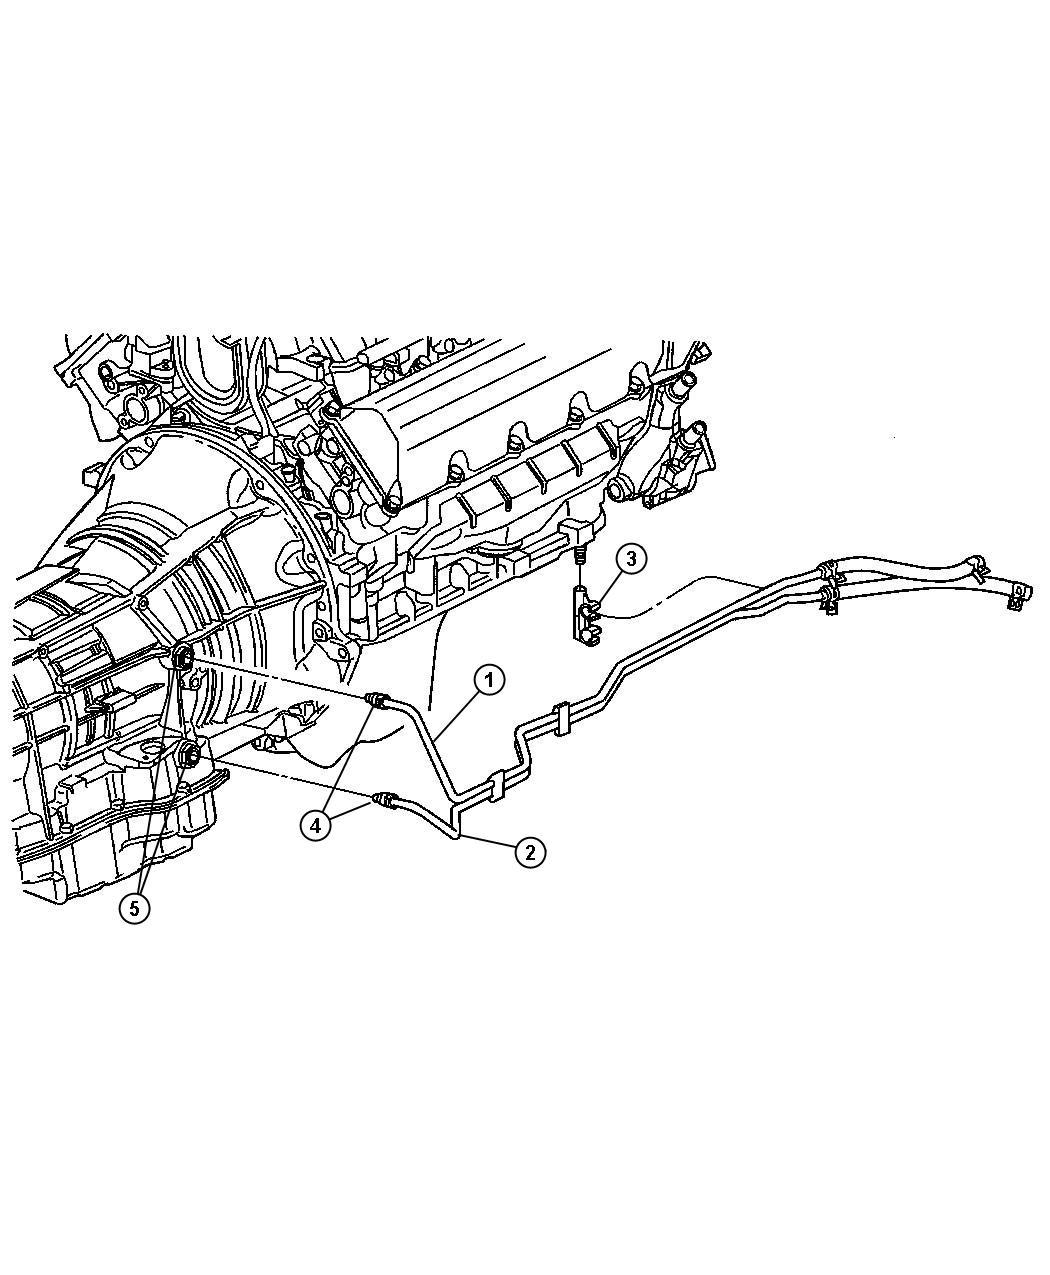 Dodge Durango 4 7l V8 Mpi Multi Speed Auto 45rfe